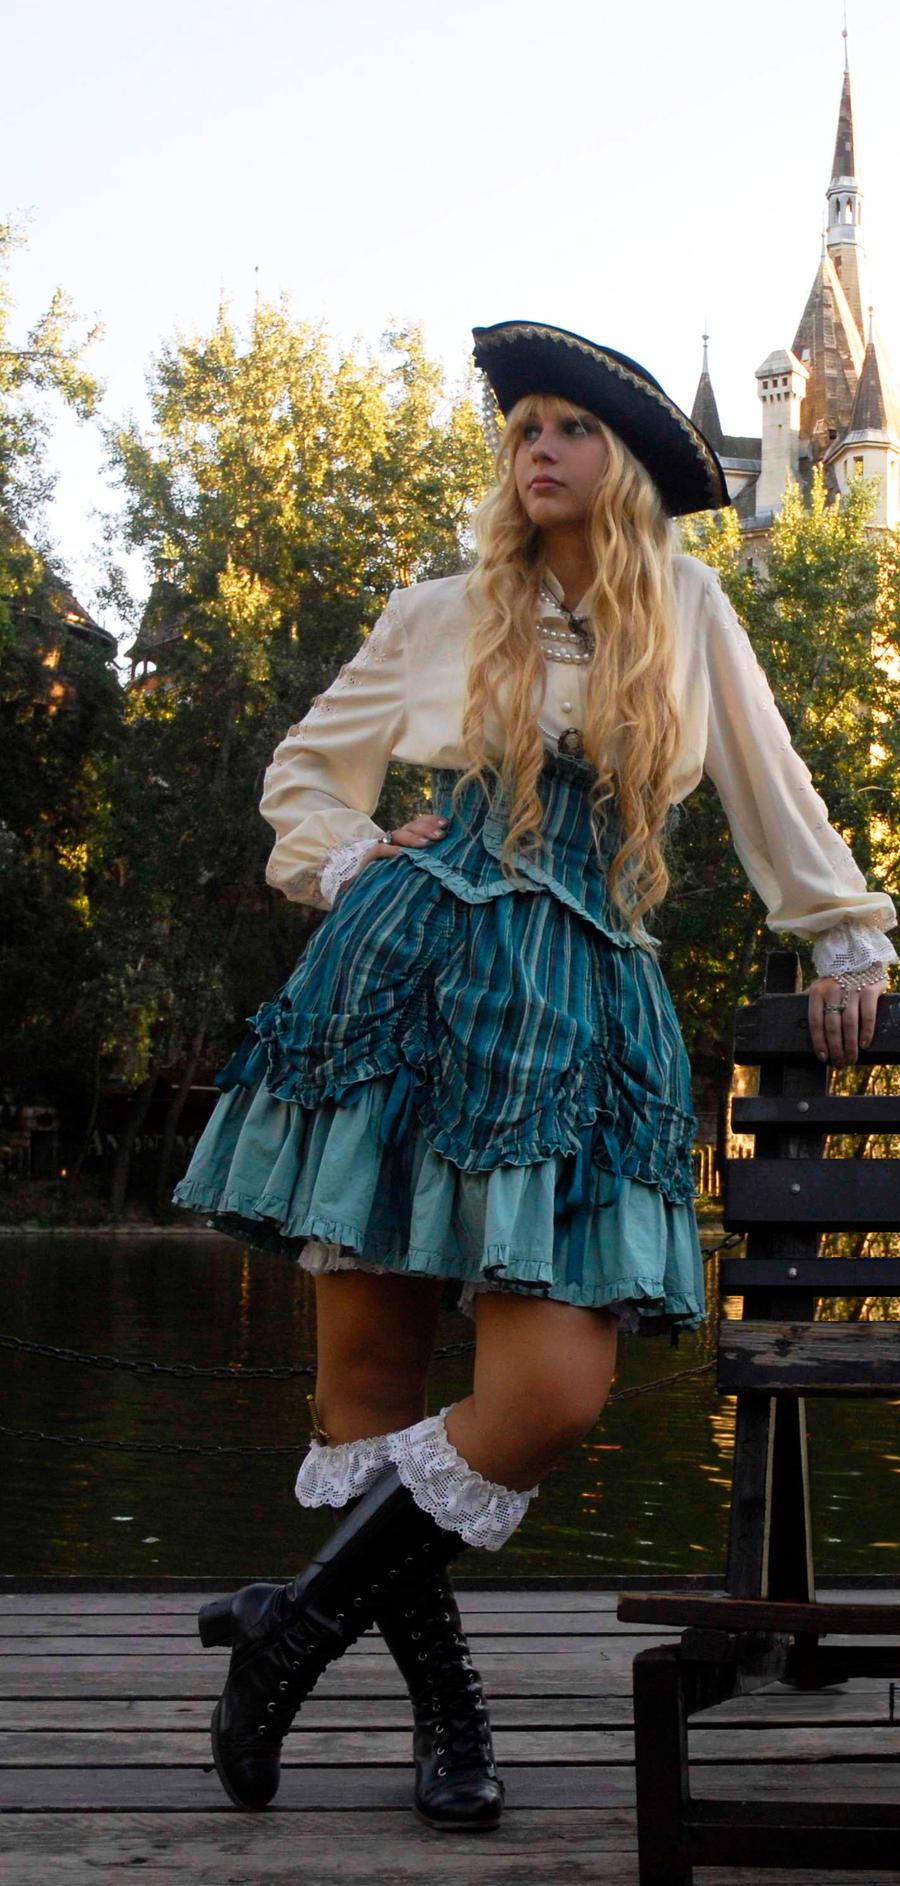 Pirate lolita by Szaloncukor